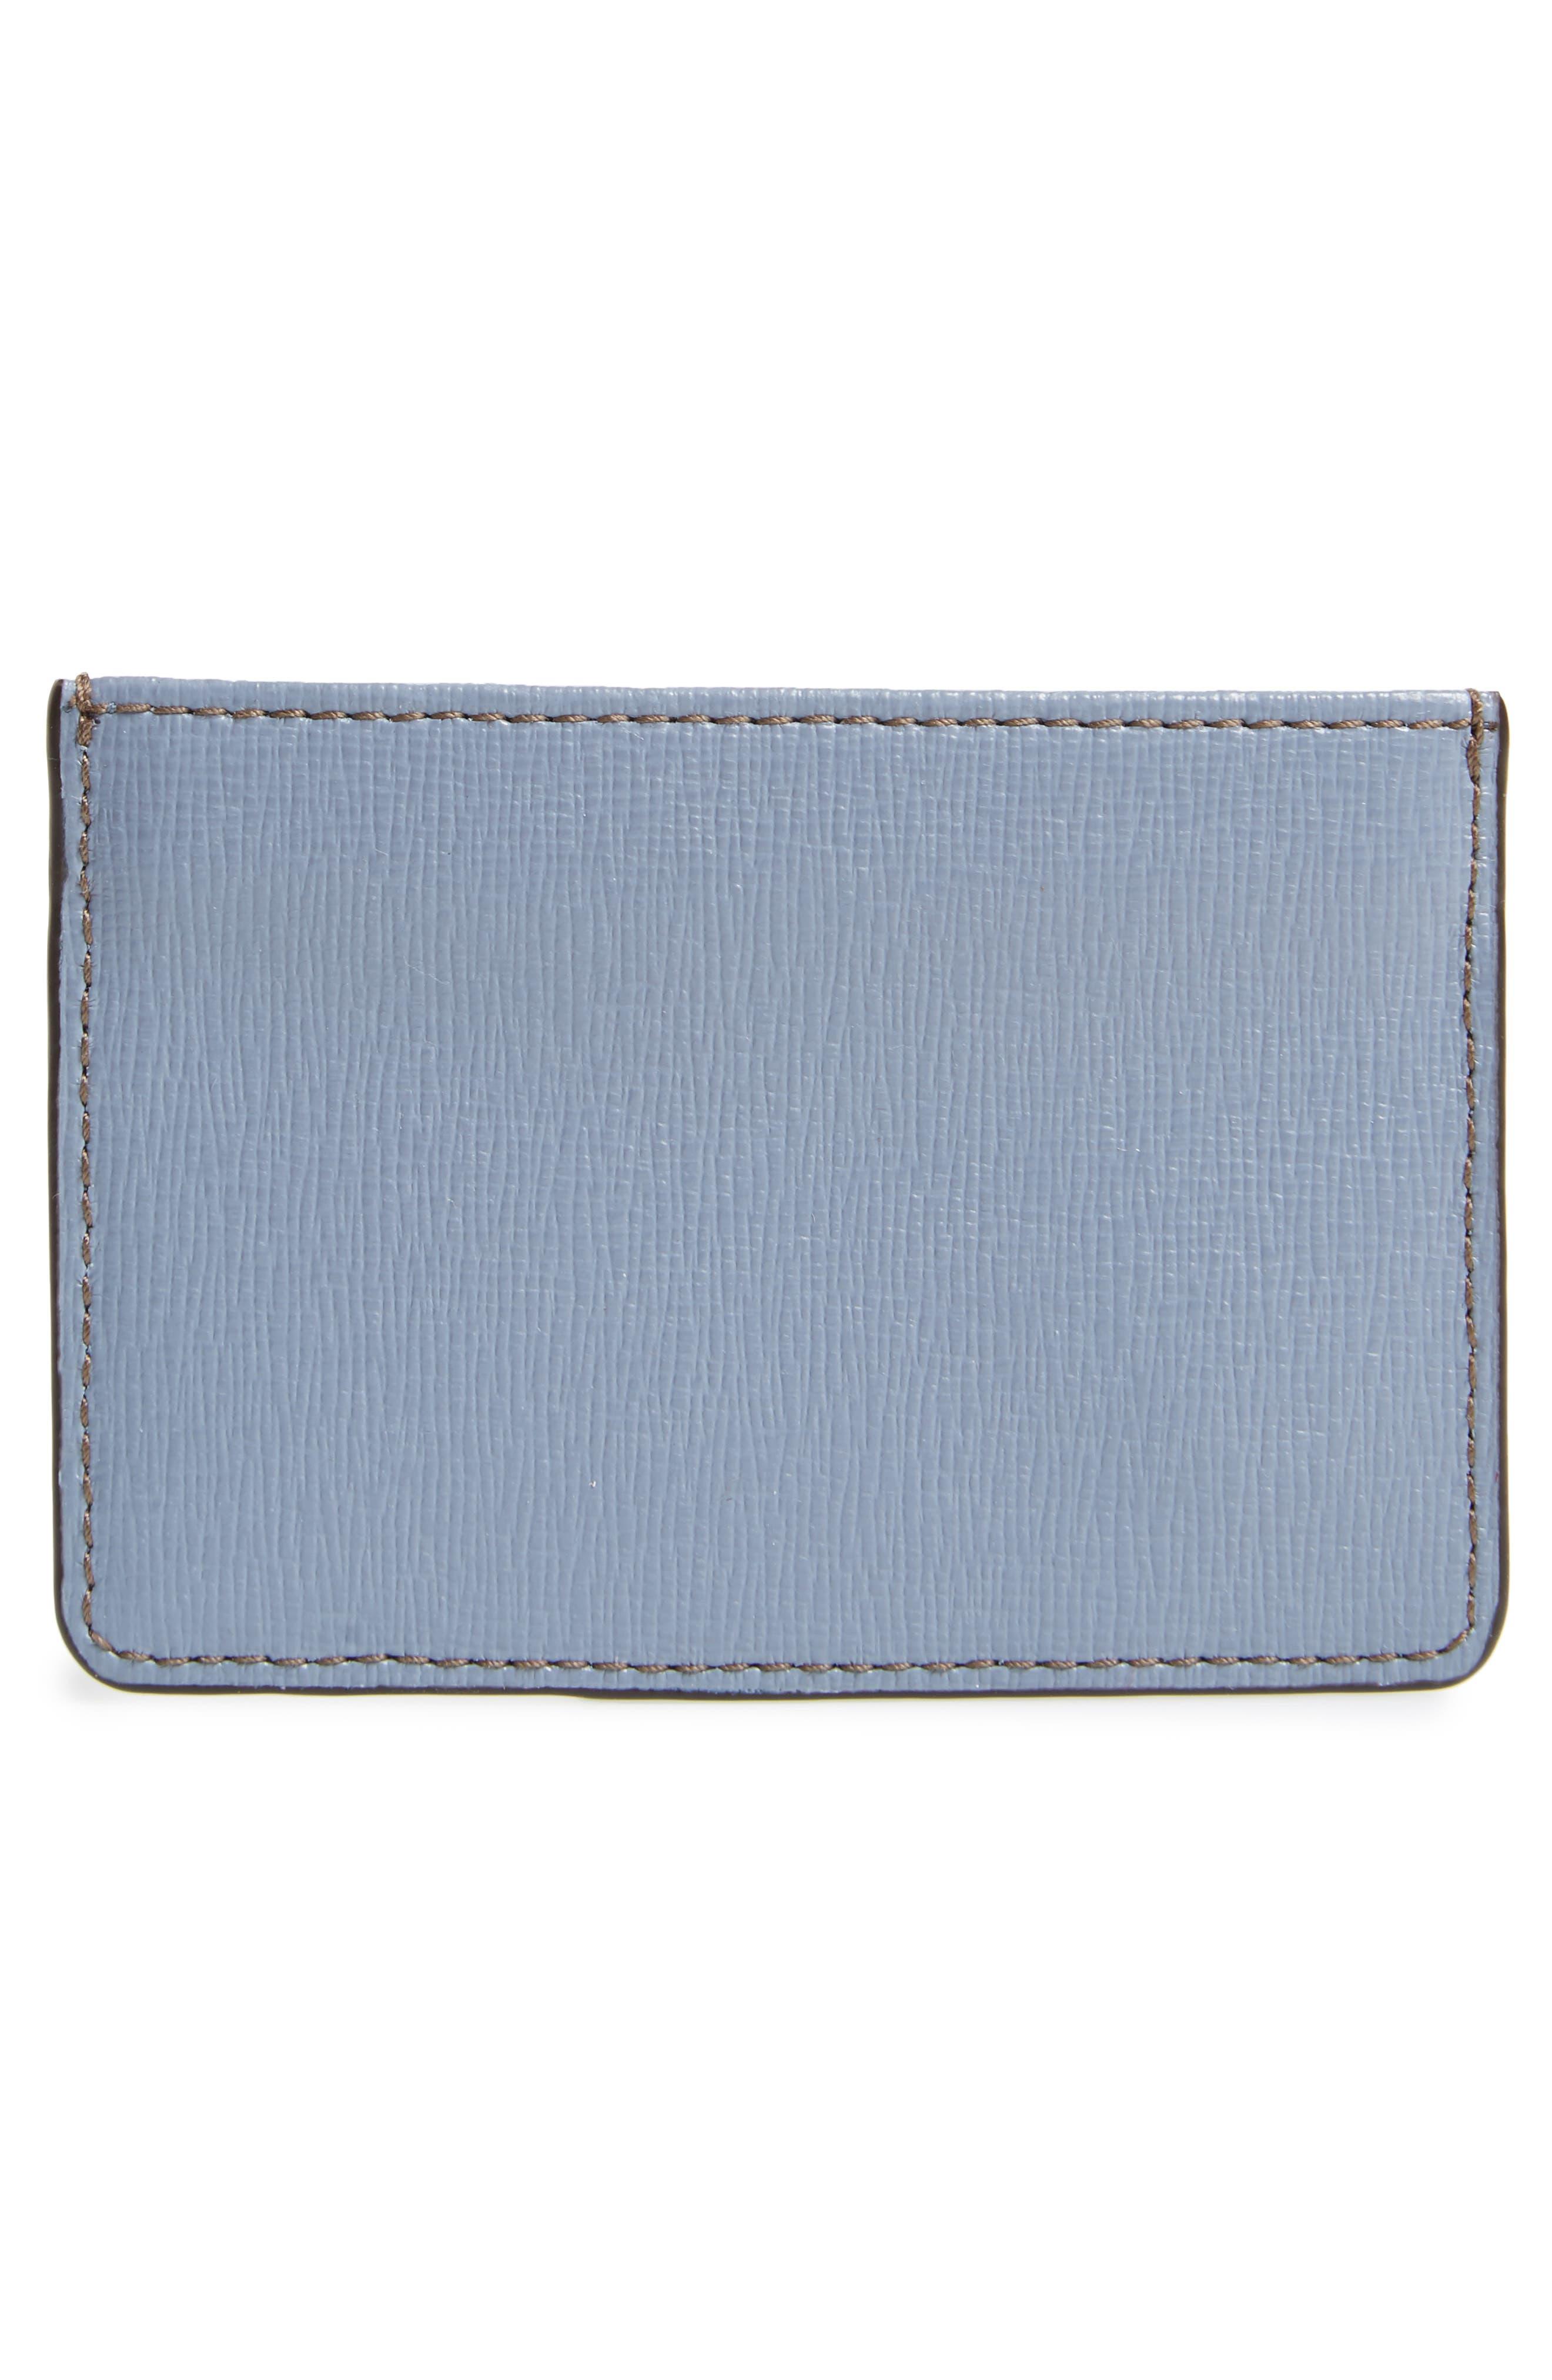 Gioia Saffiano Leather Card Case,                             Alternate thumbnail 2, color,                             Tempesta+Creta